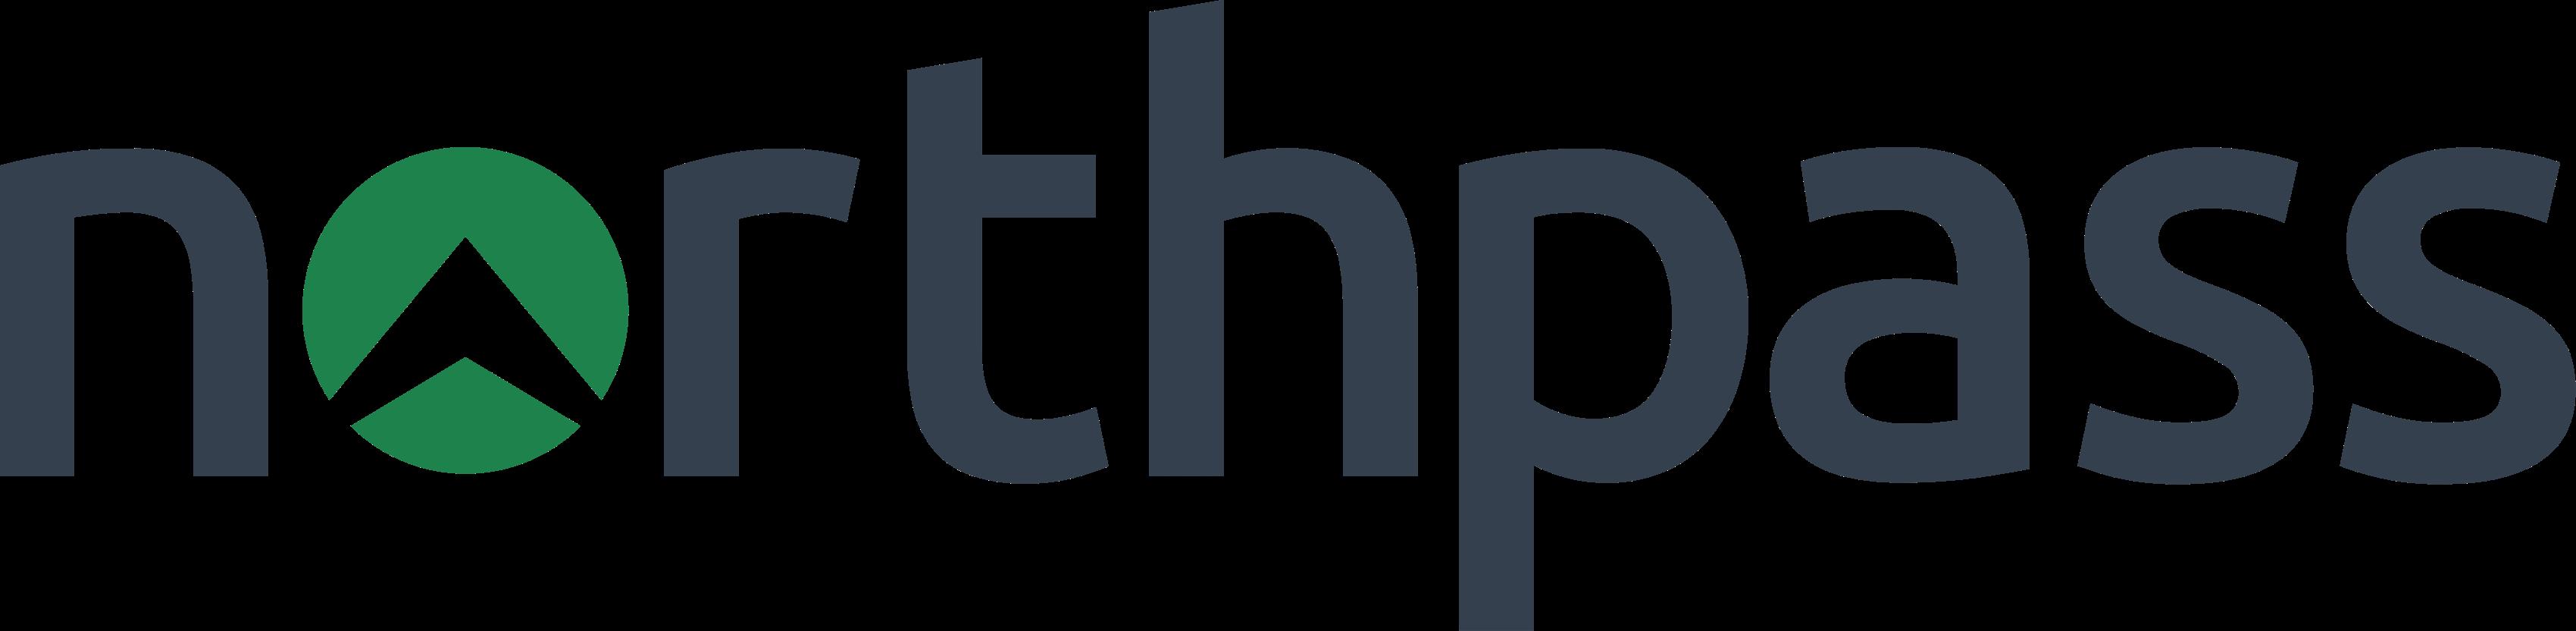 northpass_logo